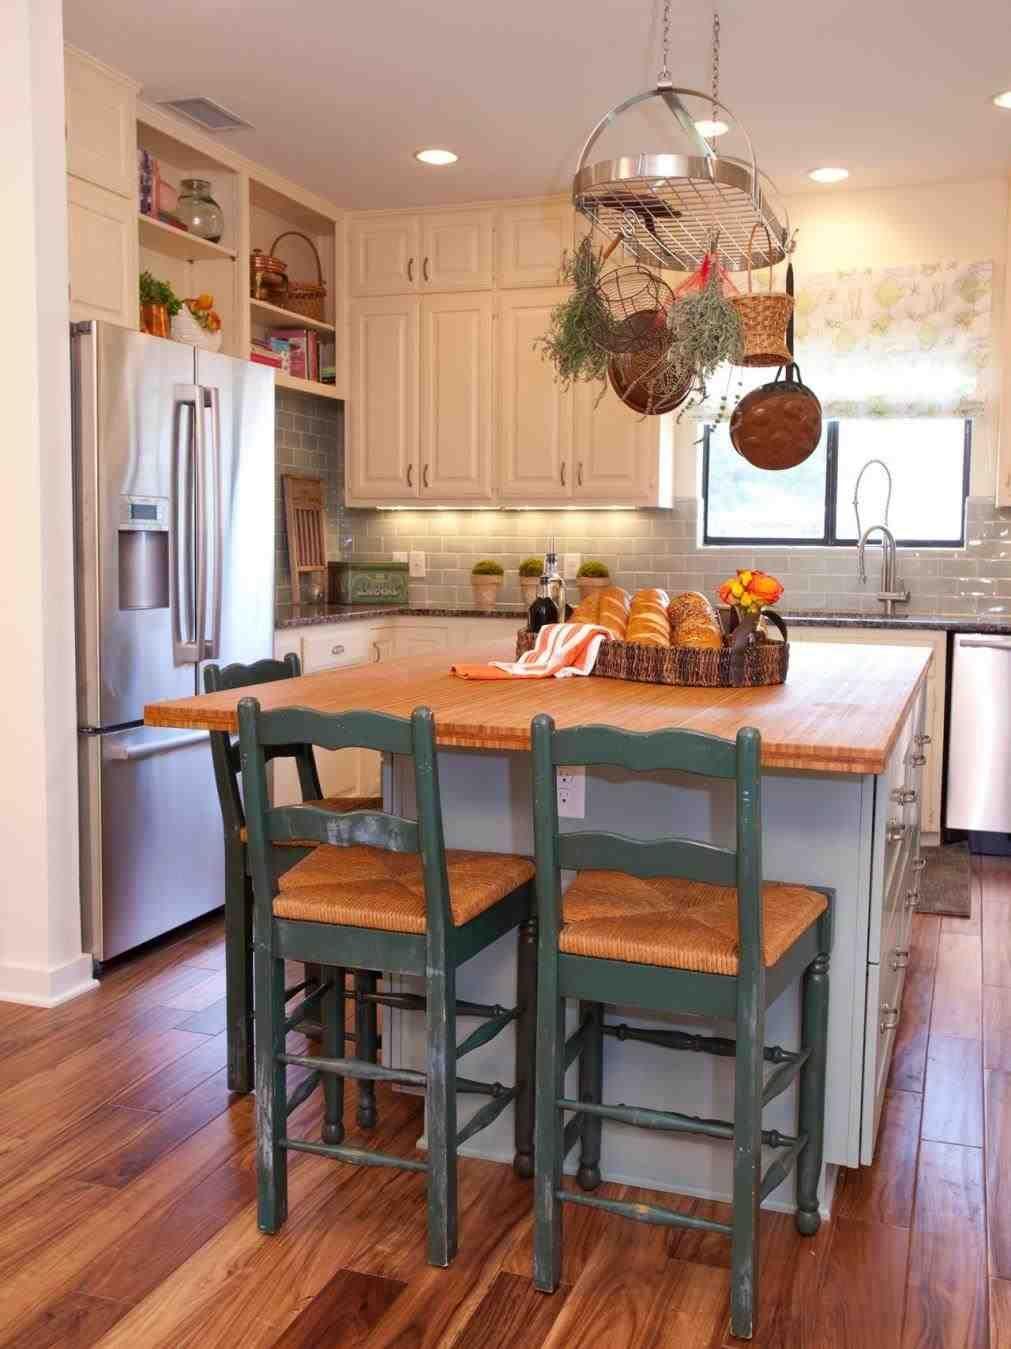 new post stand alone kitchen islands with seating small kitchen layouts modern kitchen design on kitchen island ideas organization id=30602